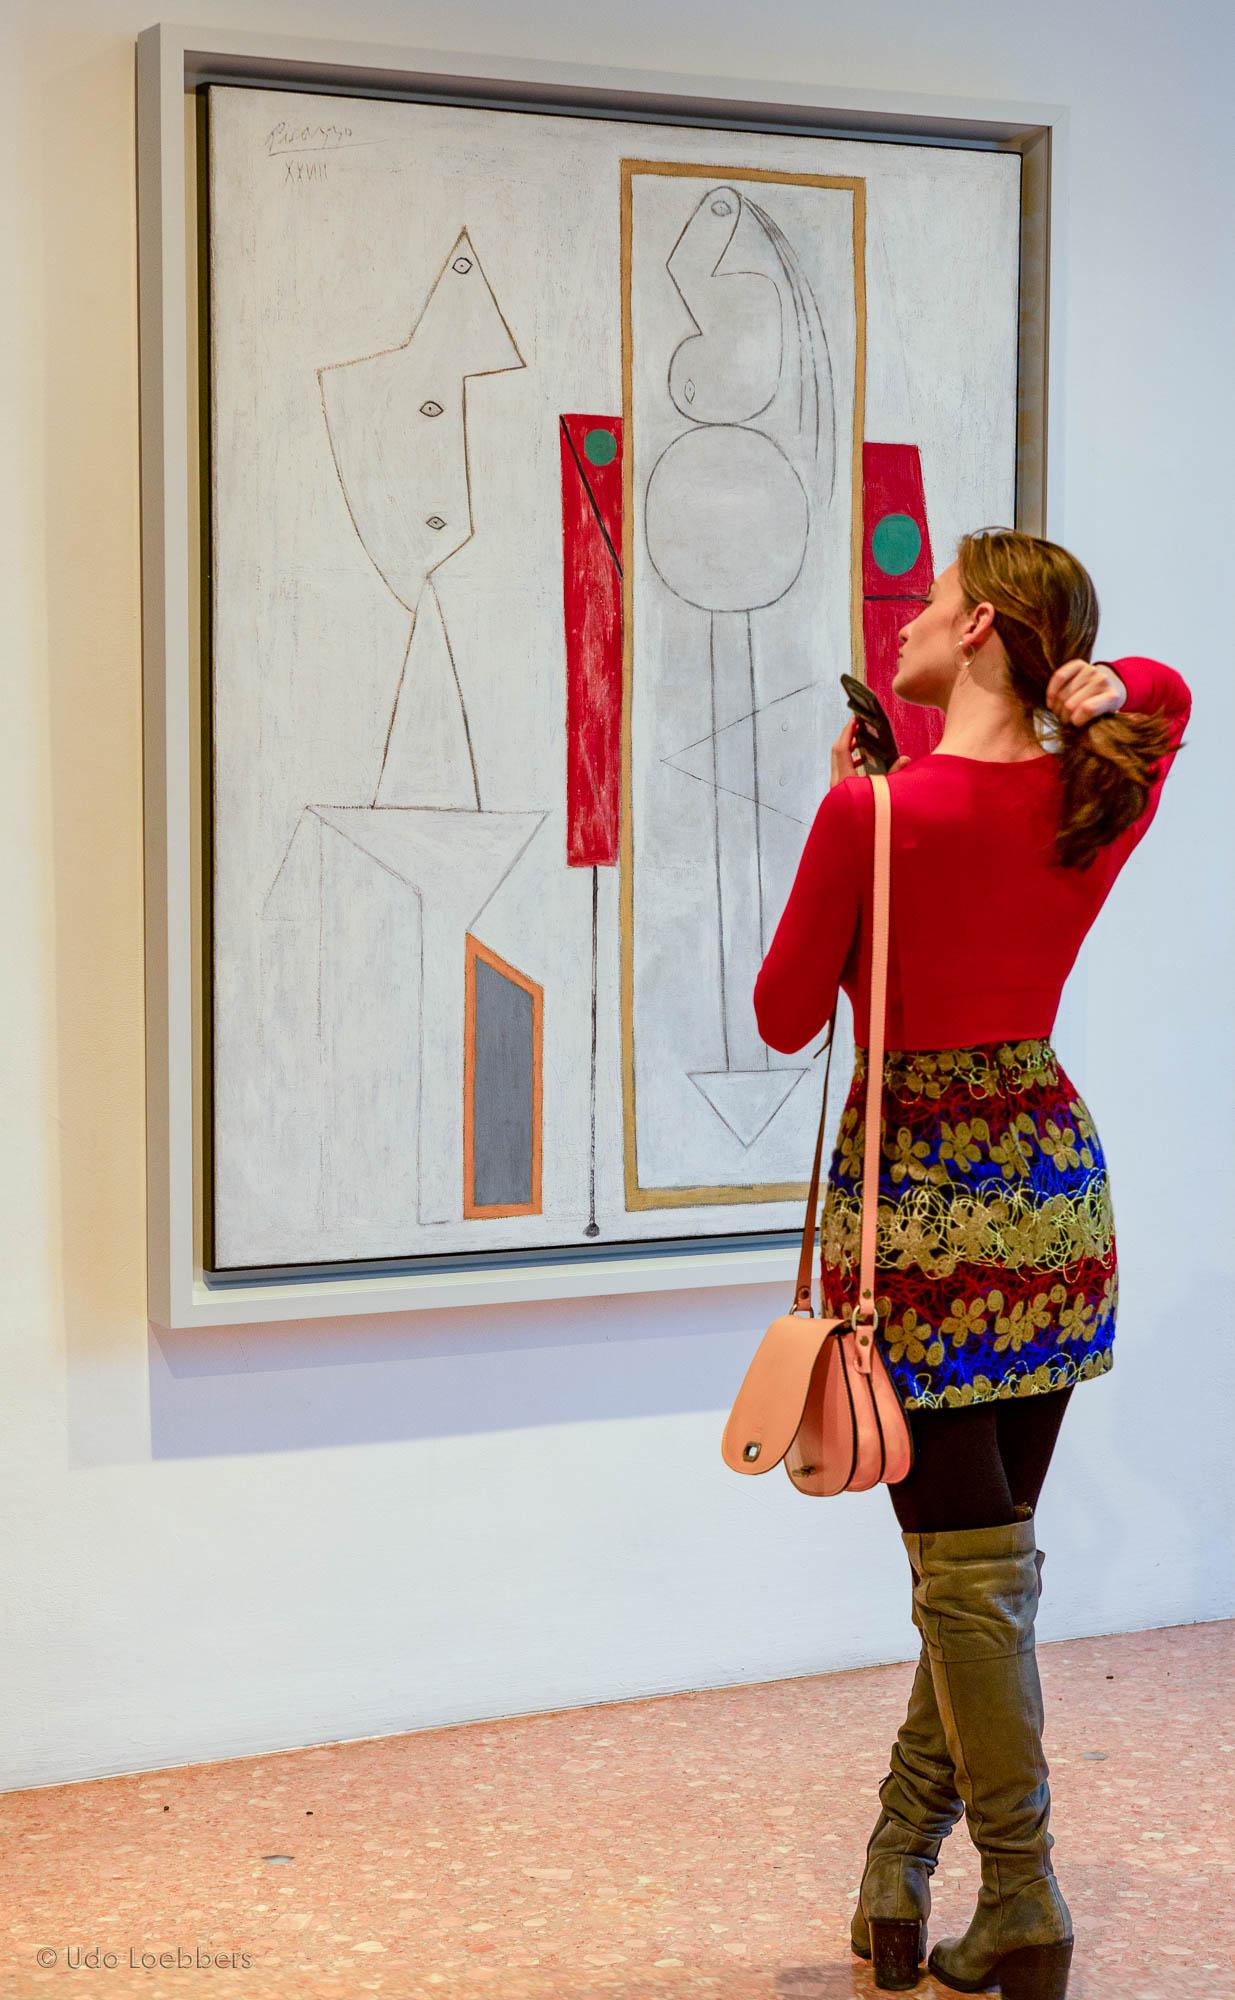 Peggy Guggenheim Collection, Venedig